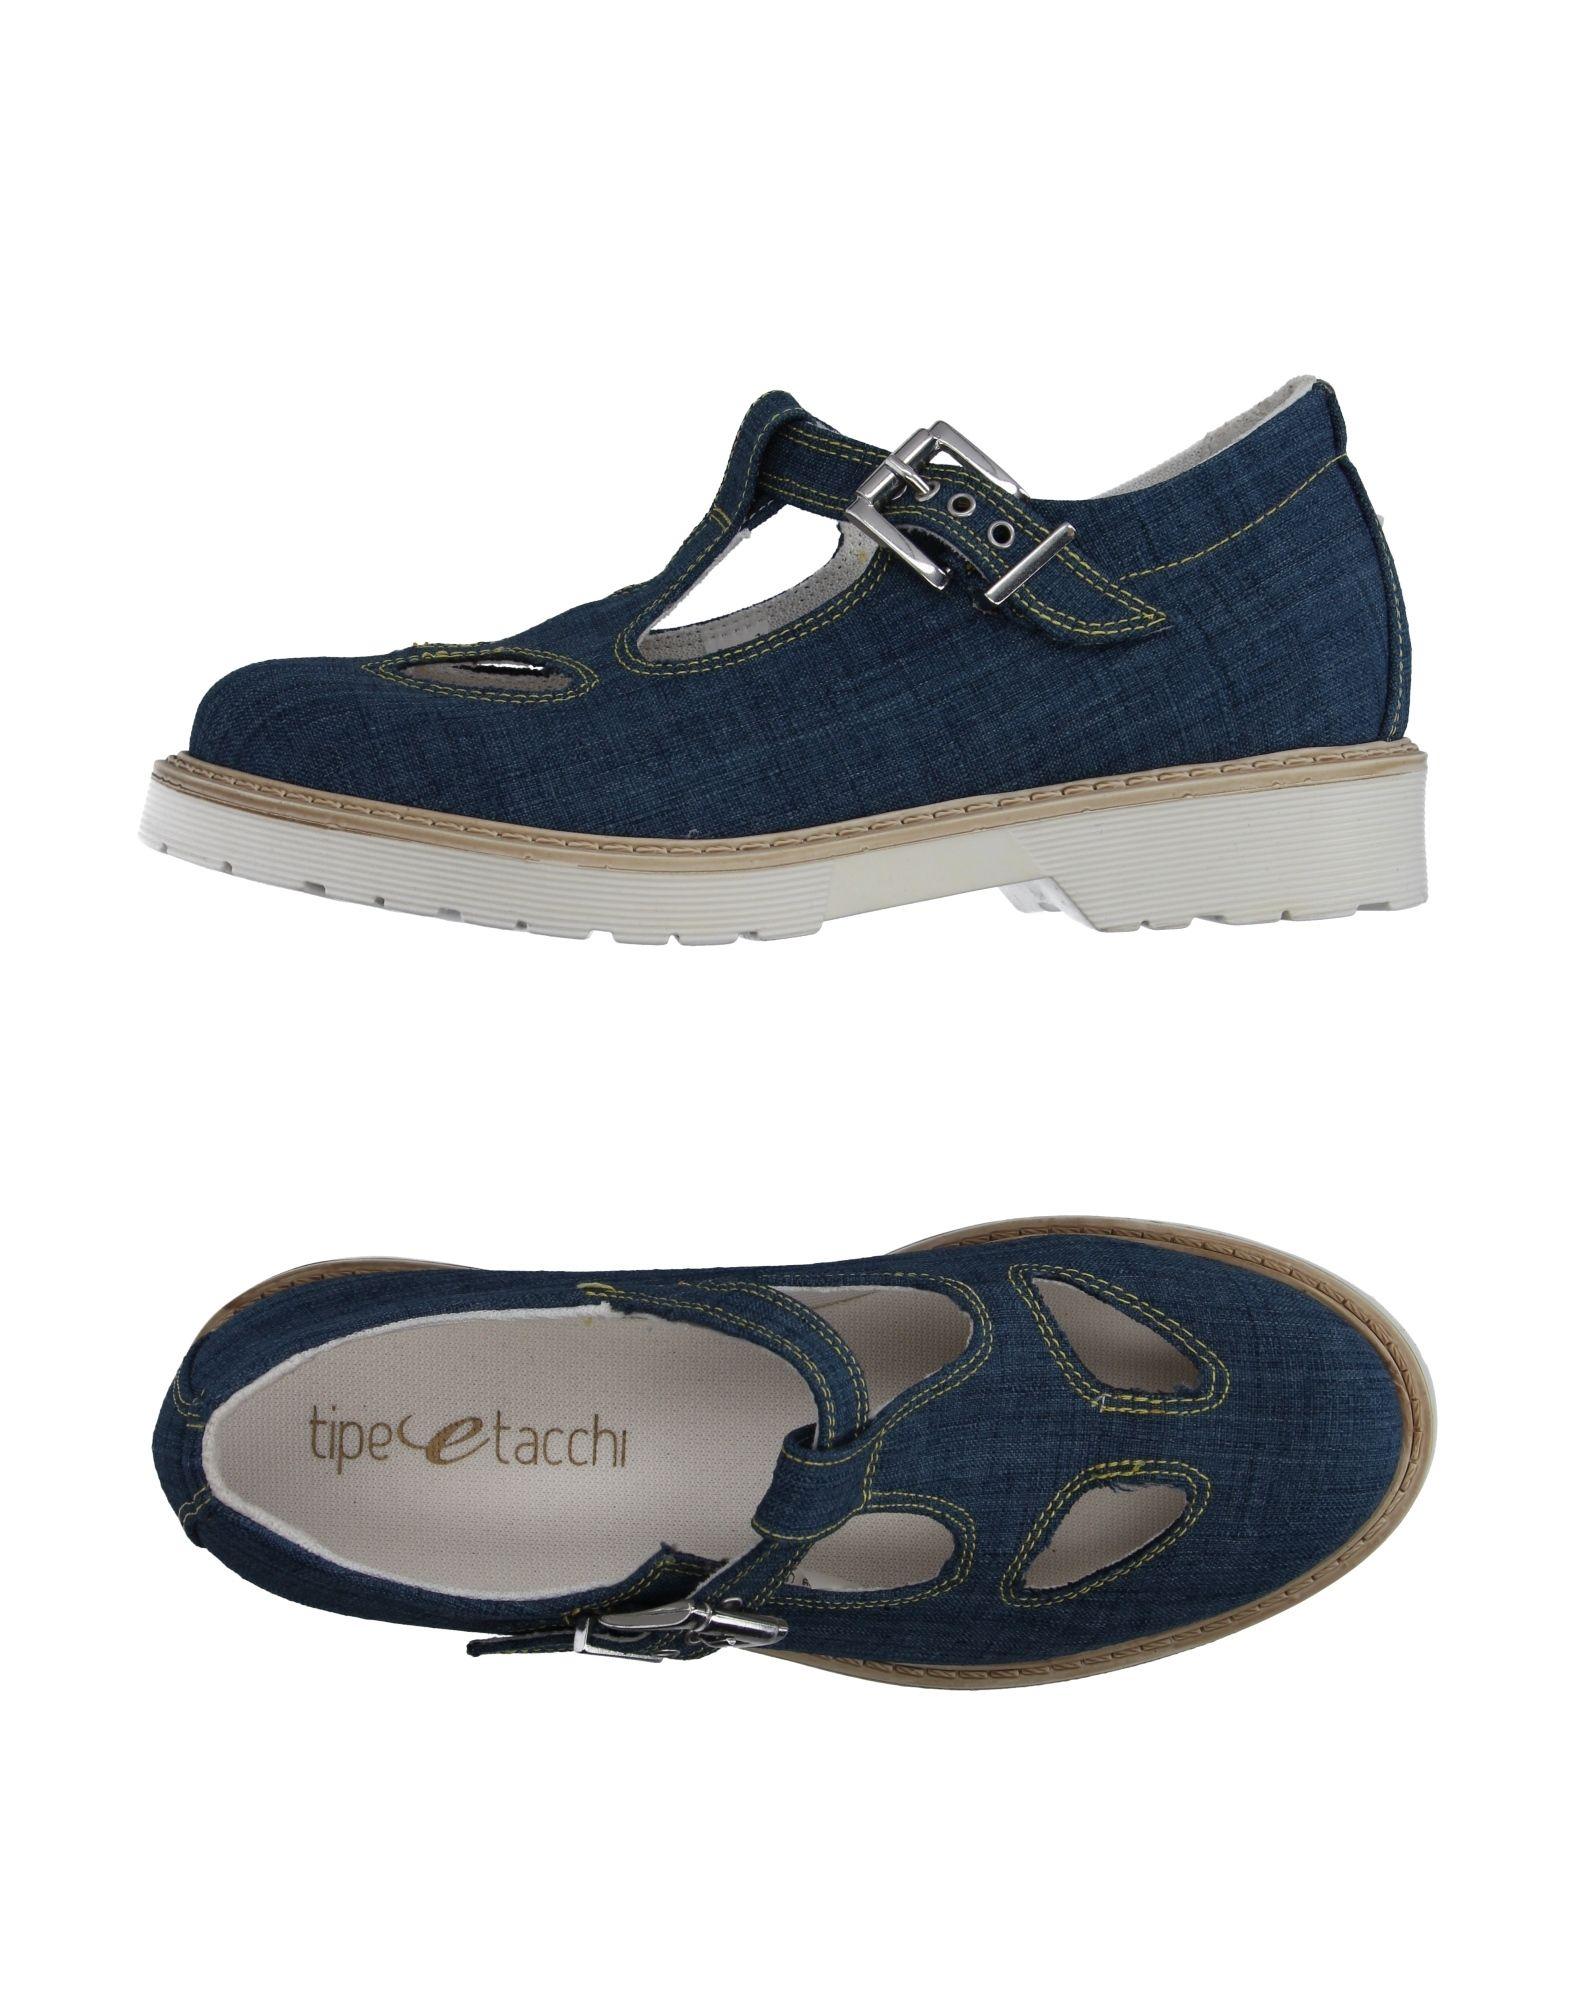 Tipe E Tacchi Sandalen Damen  11193136XF Gute Qualität beliebte Schuhe